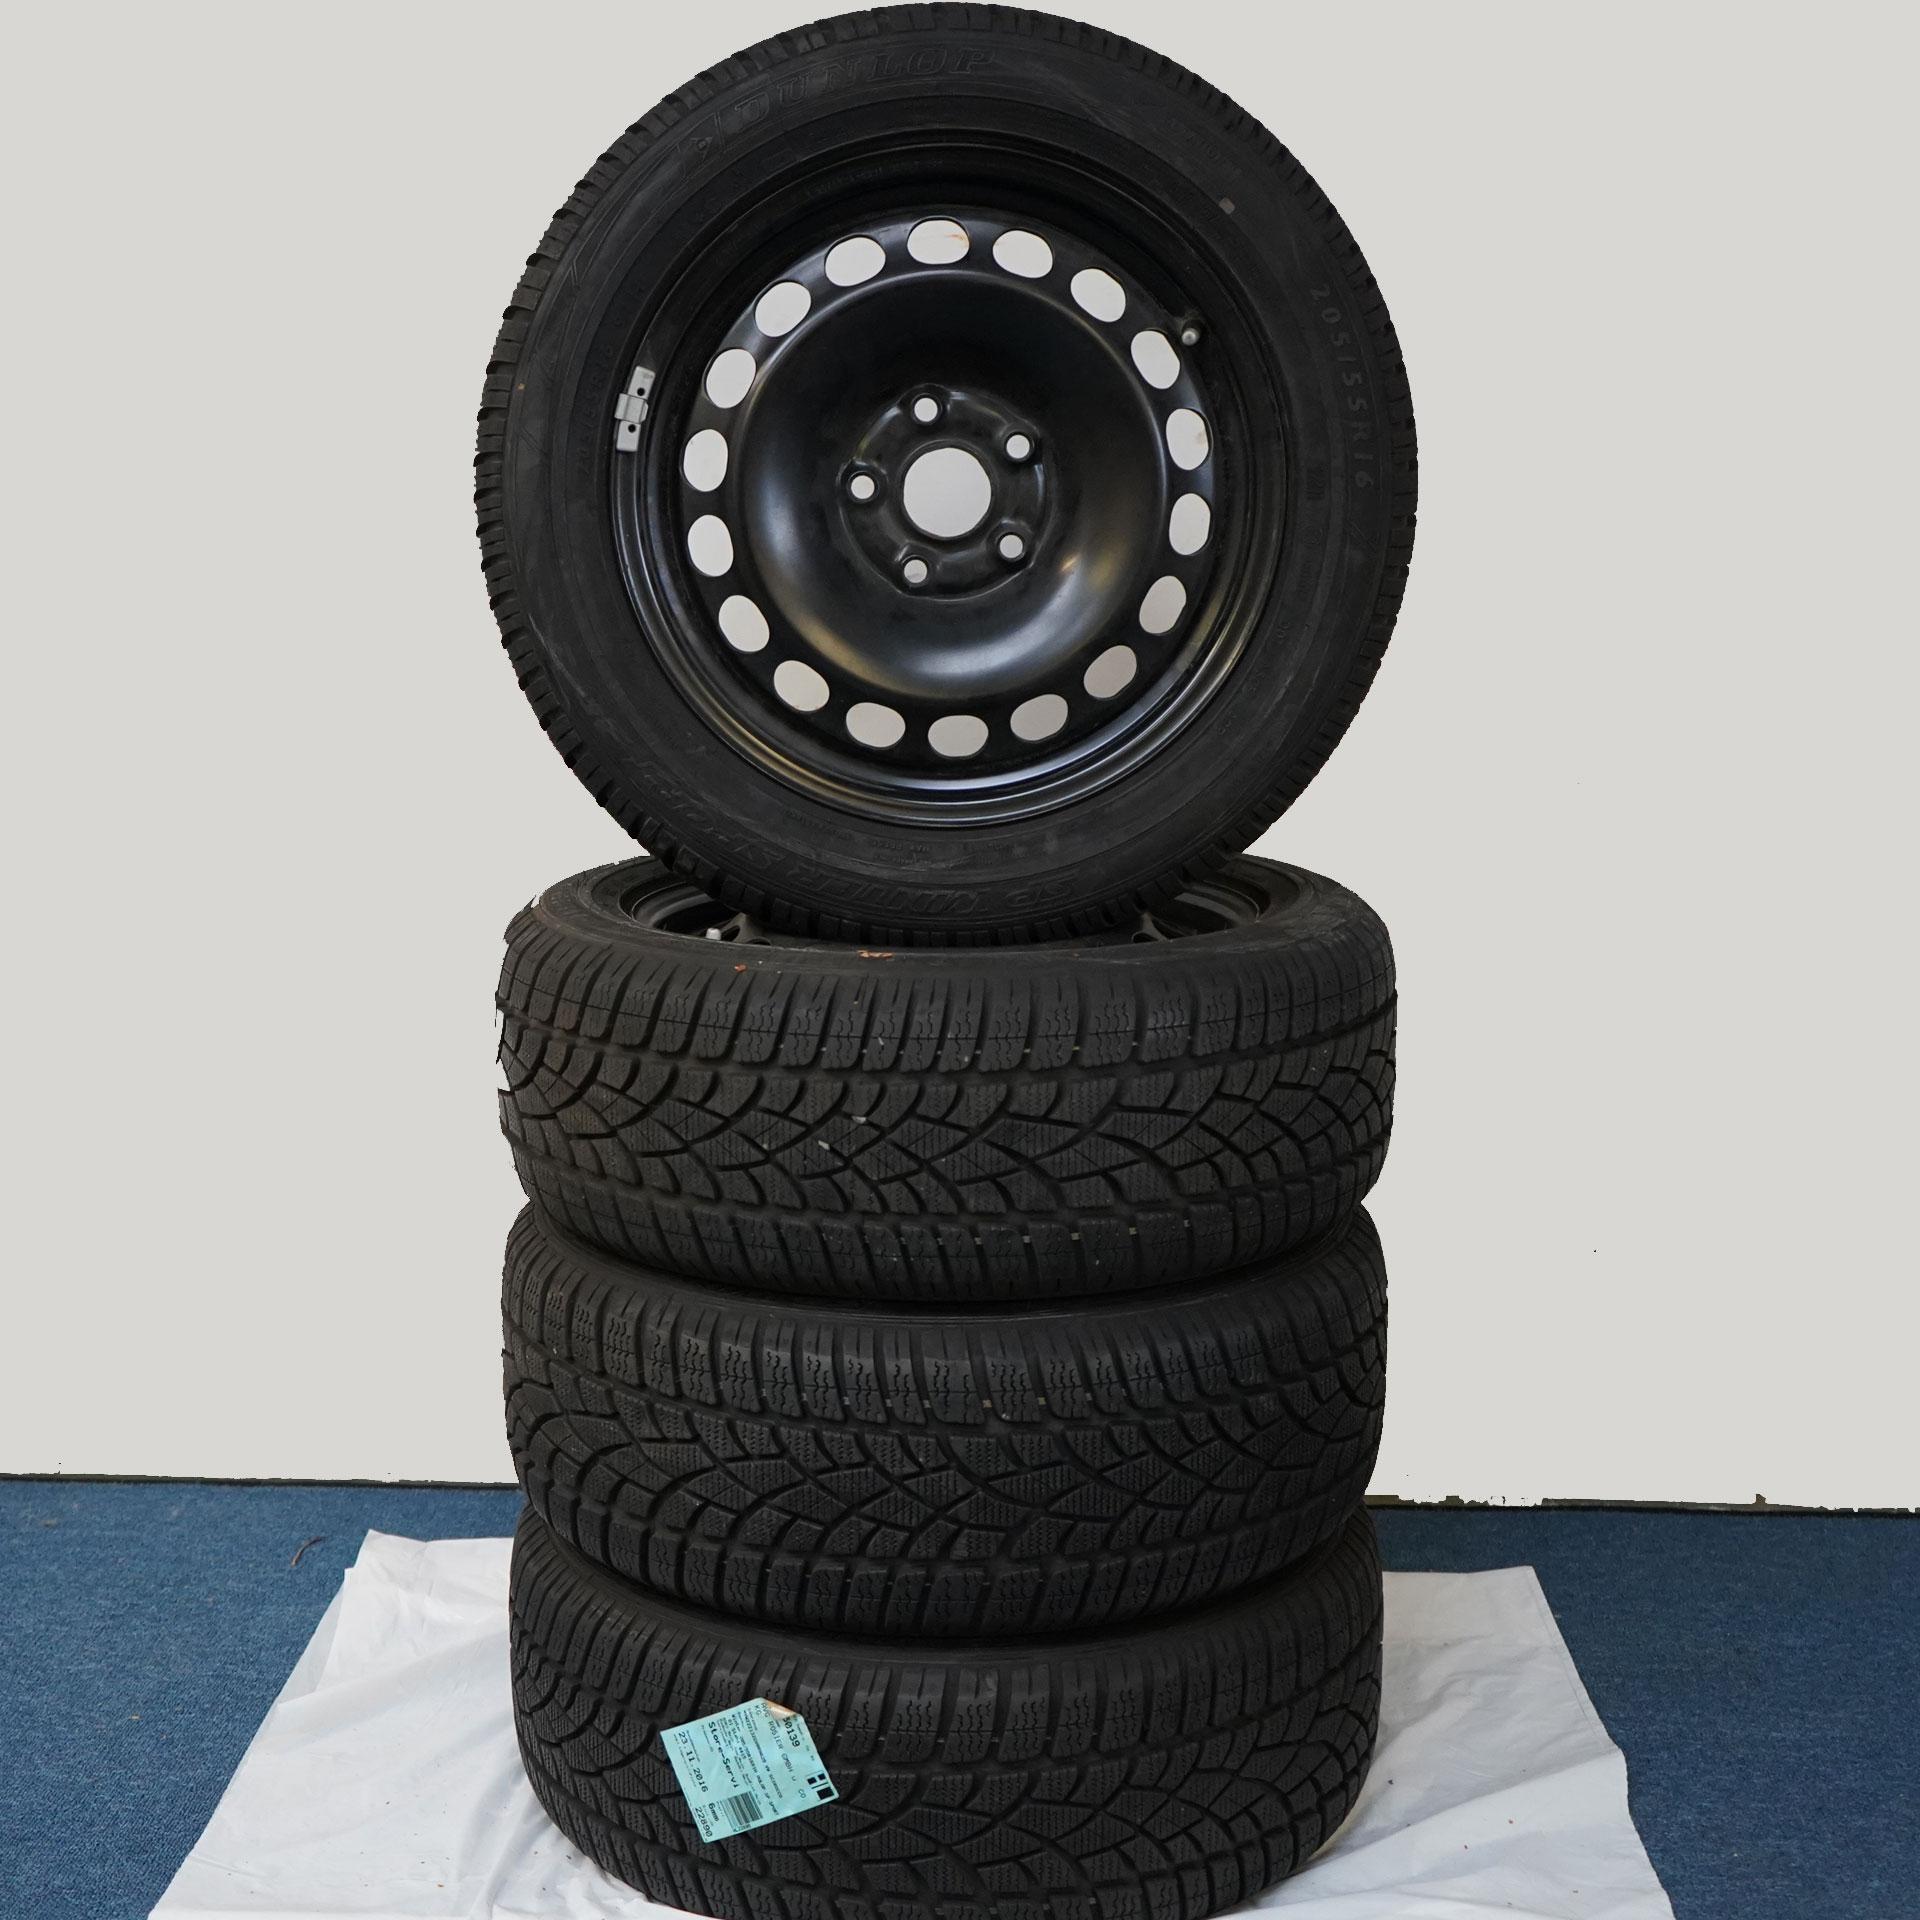 Gebrauchter 16 Zoll Original Volkswagen Winterkomplettrad-Satz VW Scirocco Dunlop